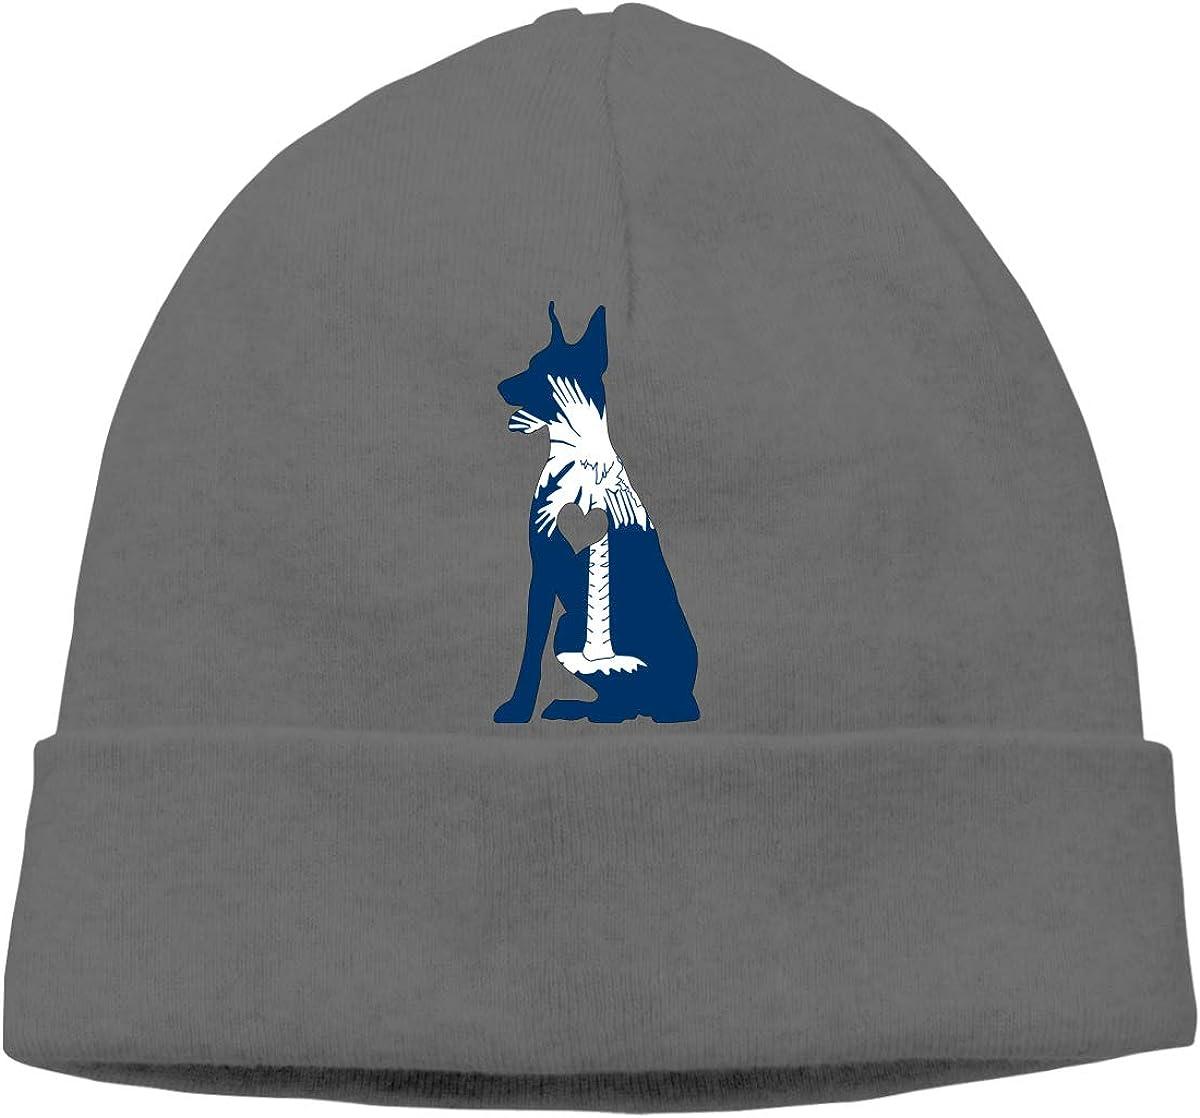 South Carolina Flag Adore Dobermans Beanie Hat for Men Women,Soft Knitted Cap Skiing Cap